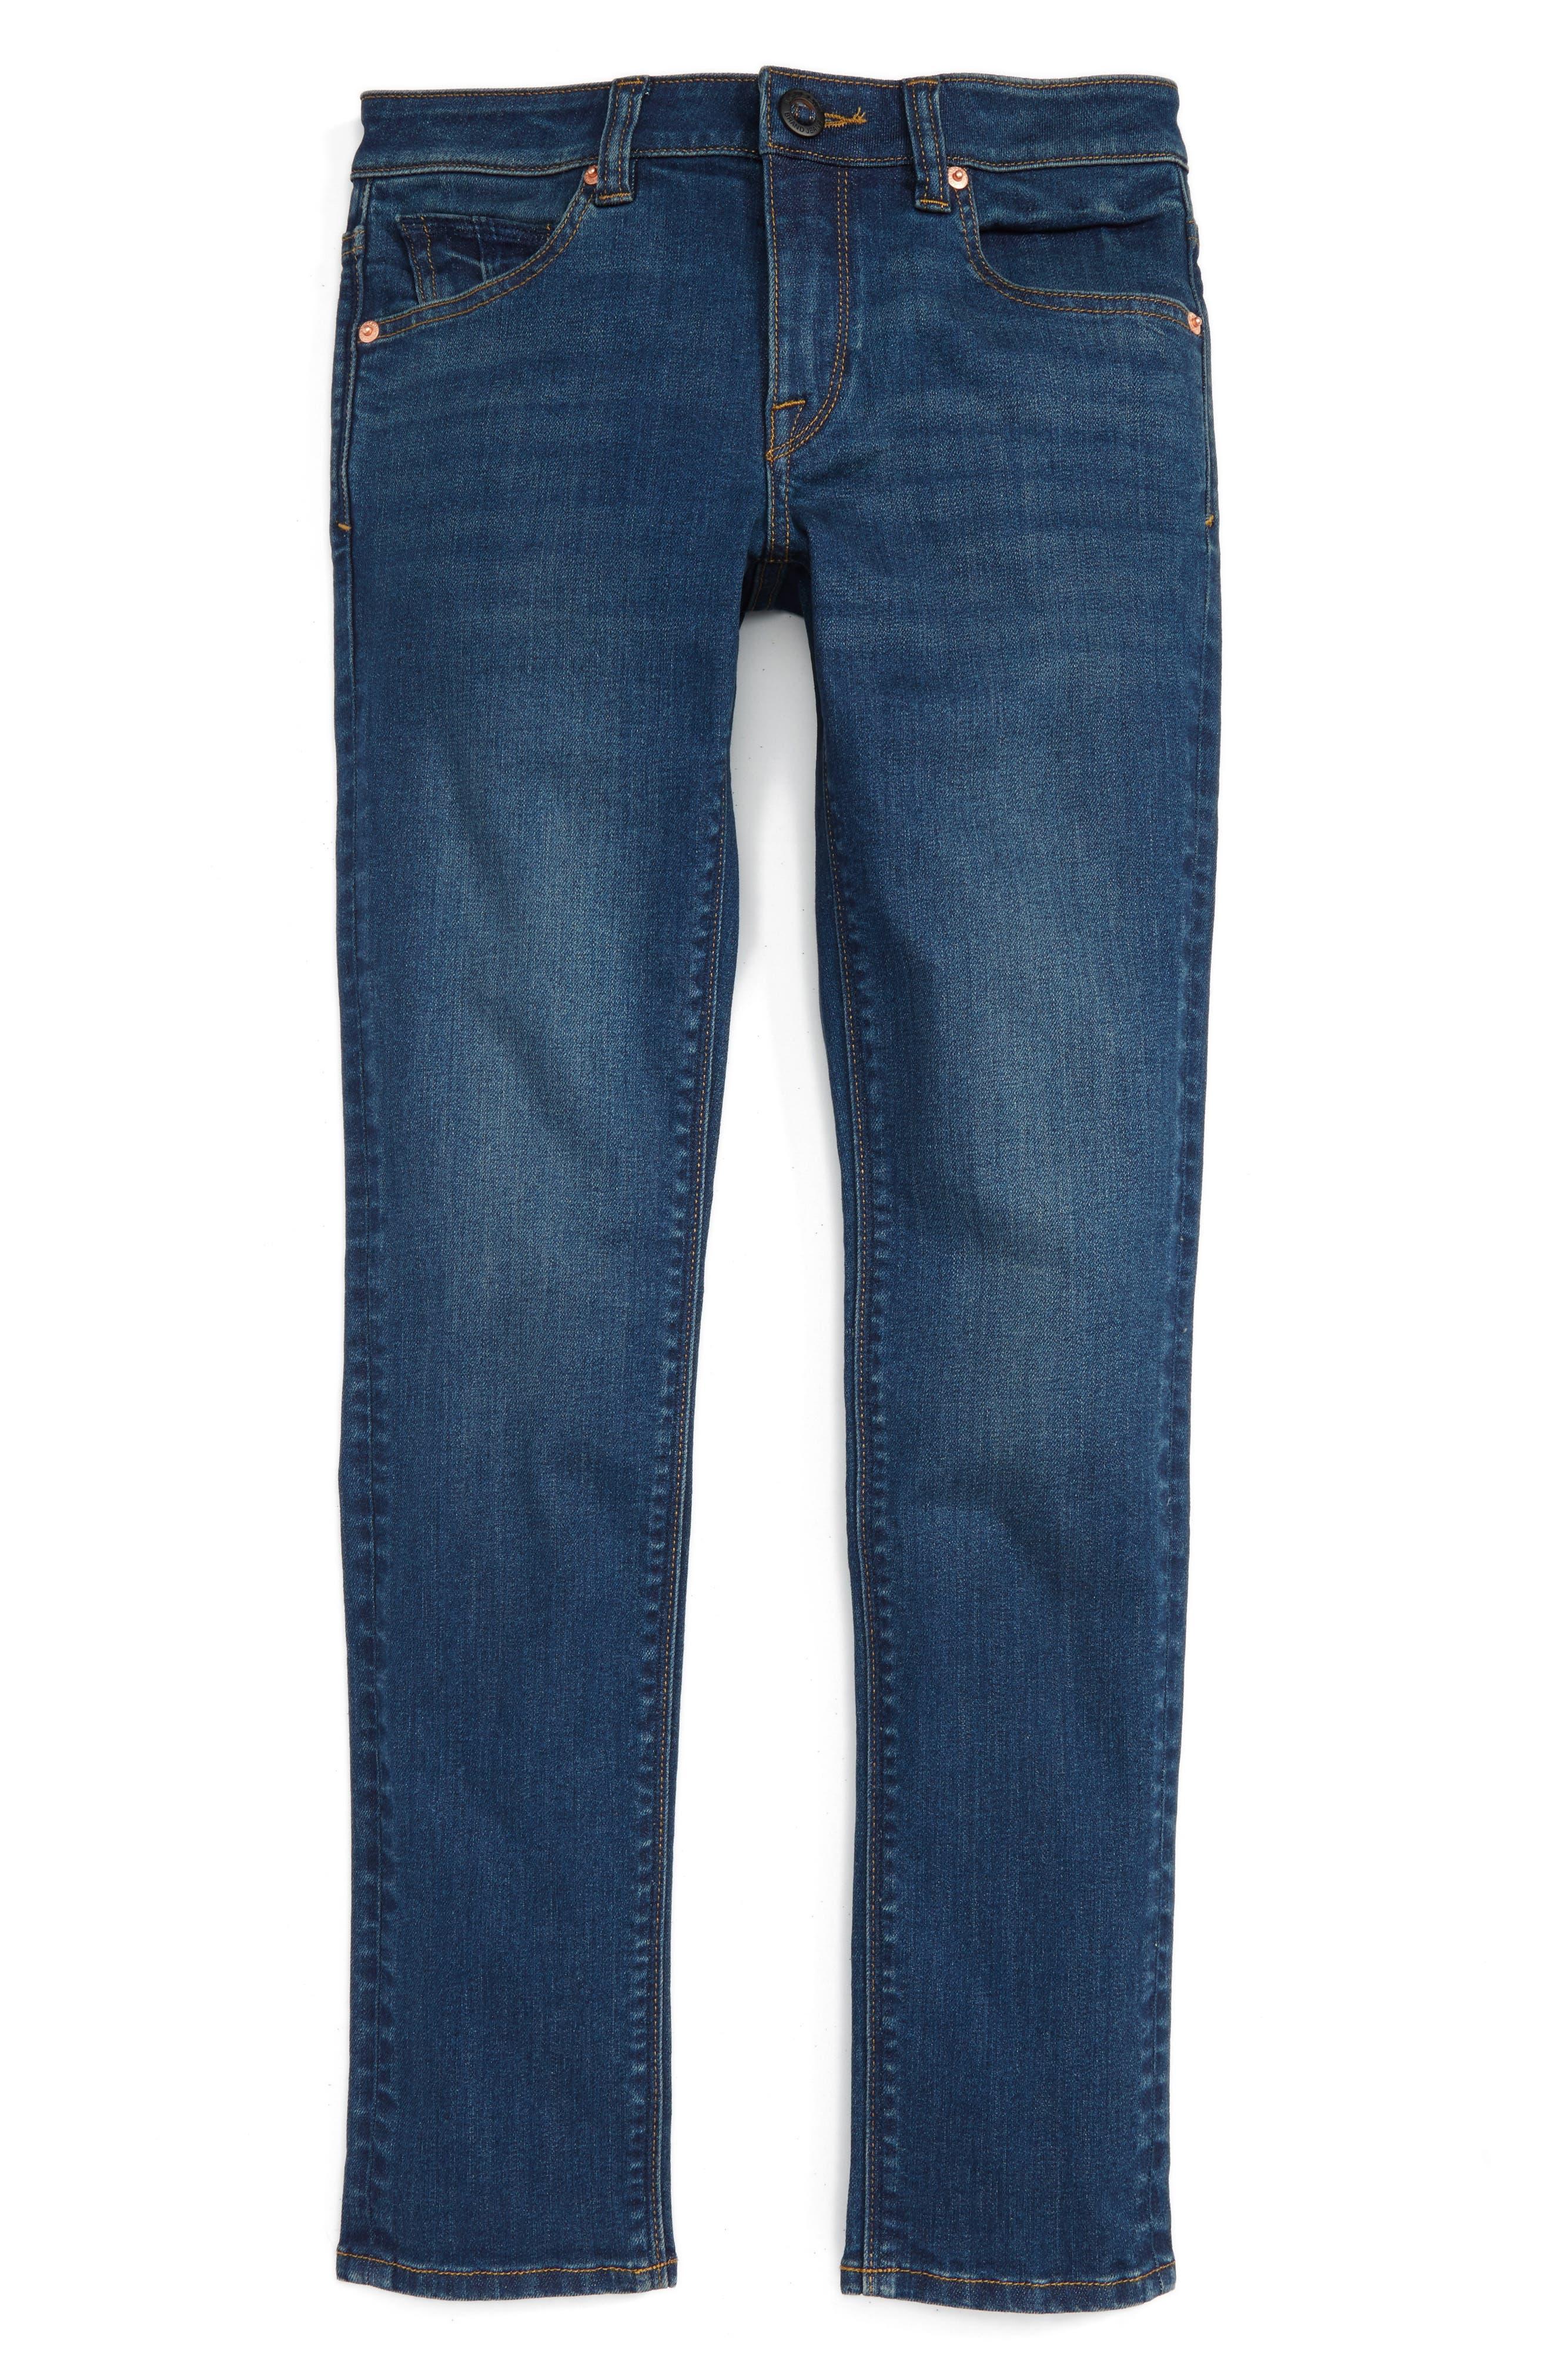 Volcom 'Solver' Straight Leg Denim Jeans (Toddler Boys, Little Boys & Big Boys)